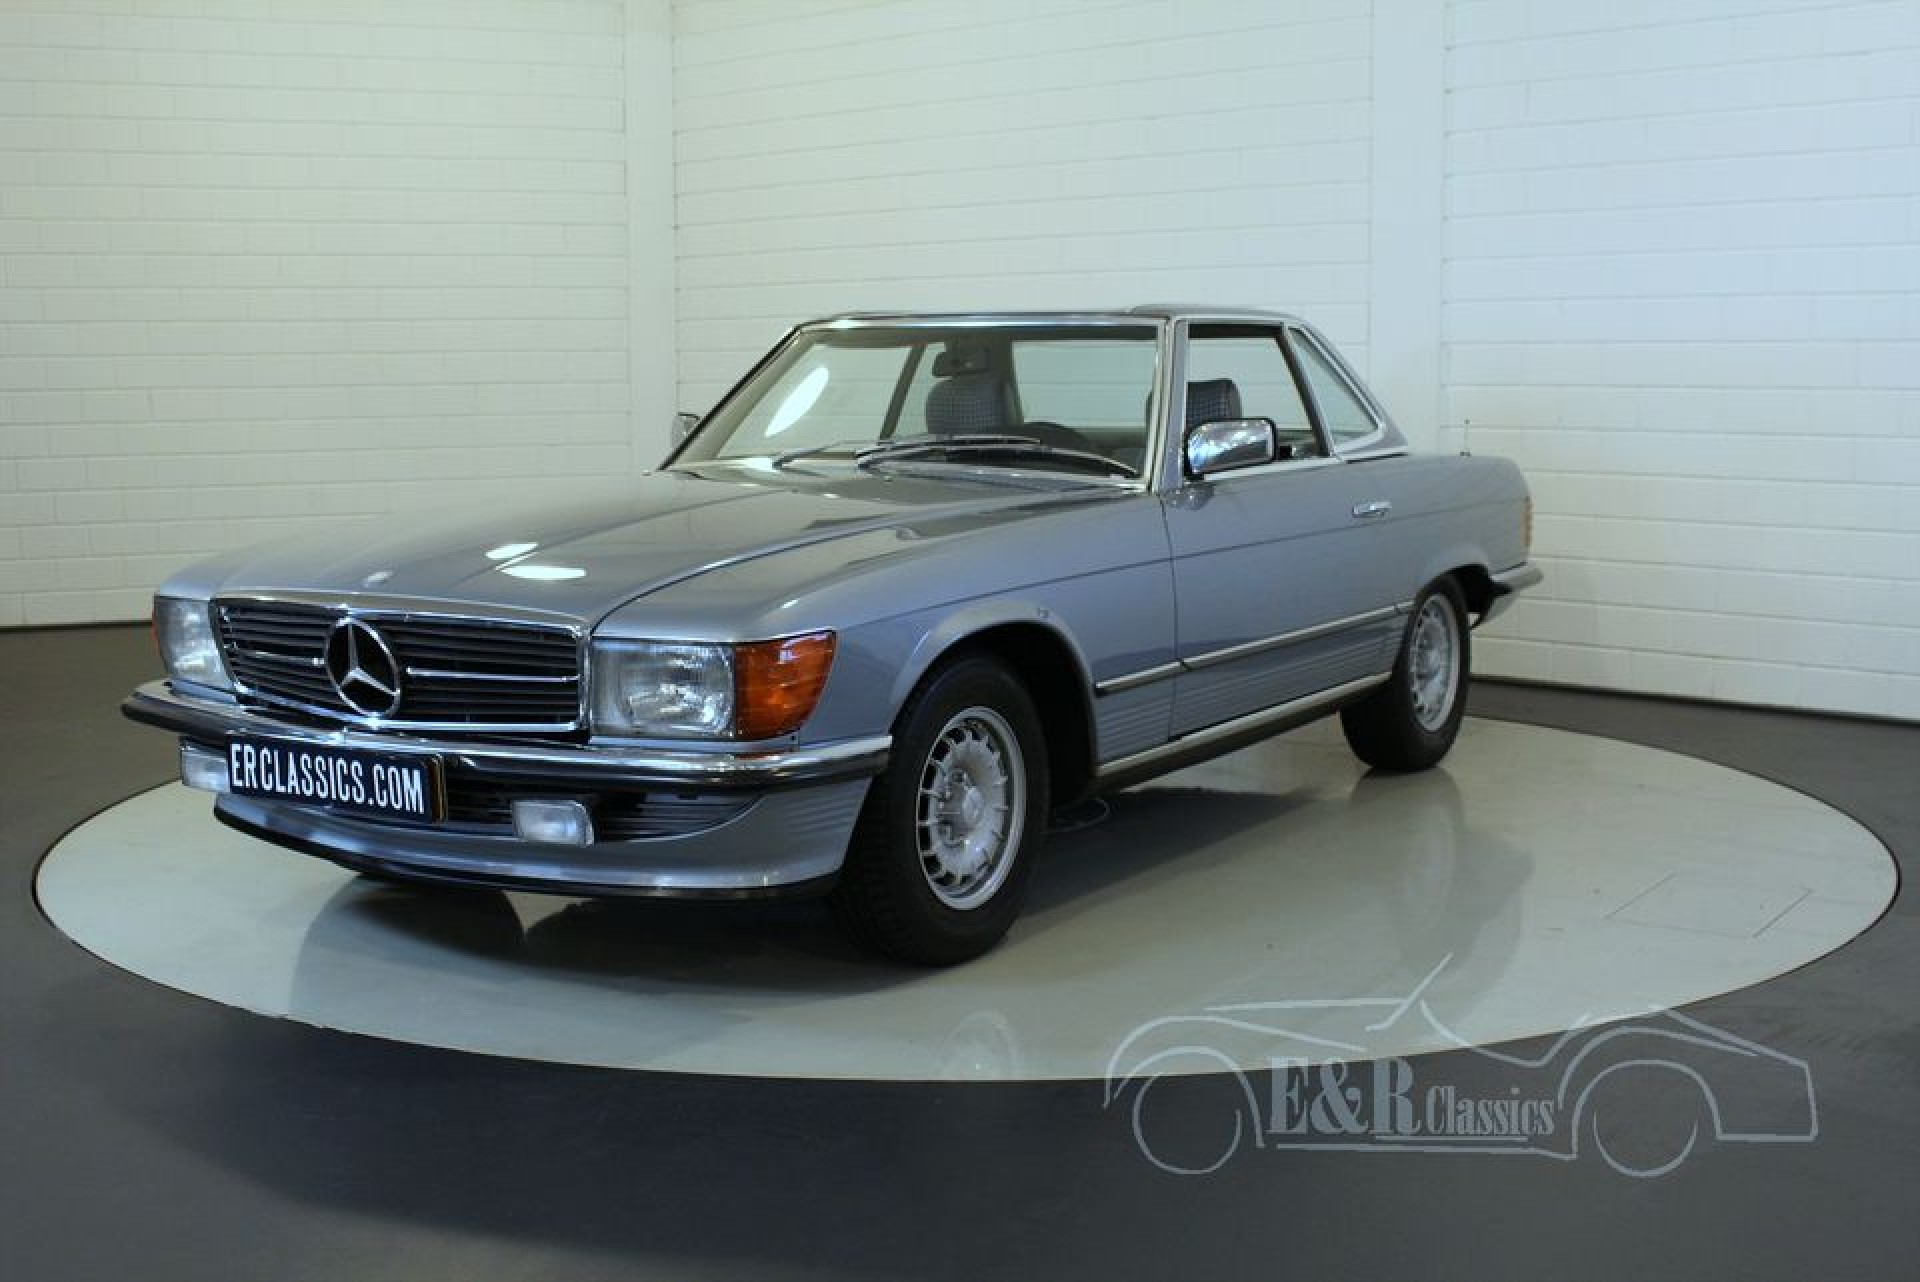 Mercedes benz 280sl cabriolet 1983 for sale at erclassics for Mercedes benz 1983